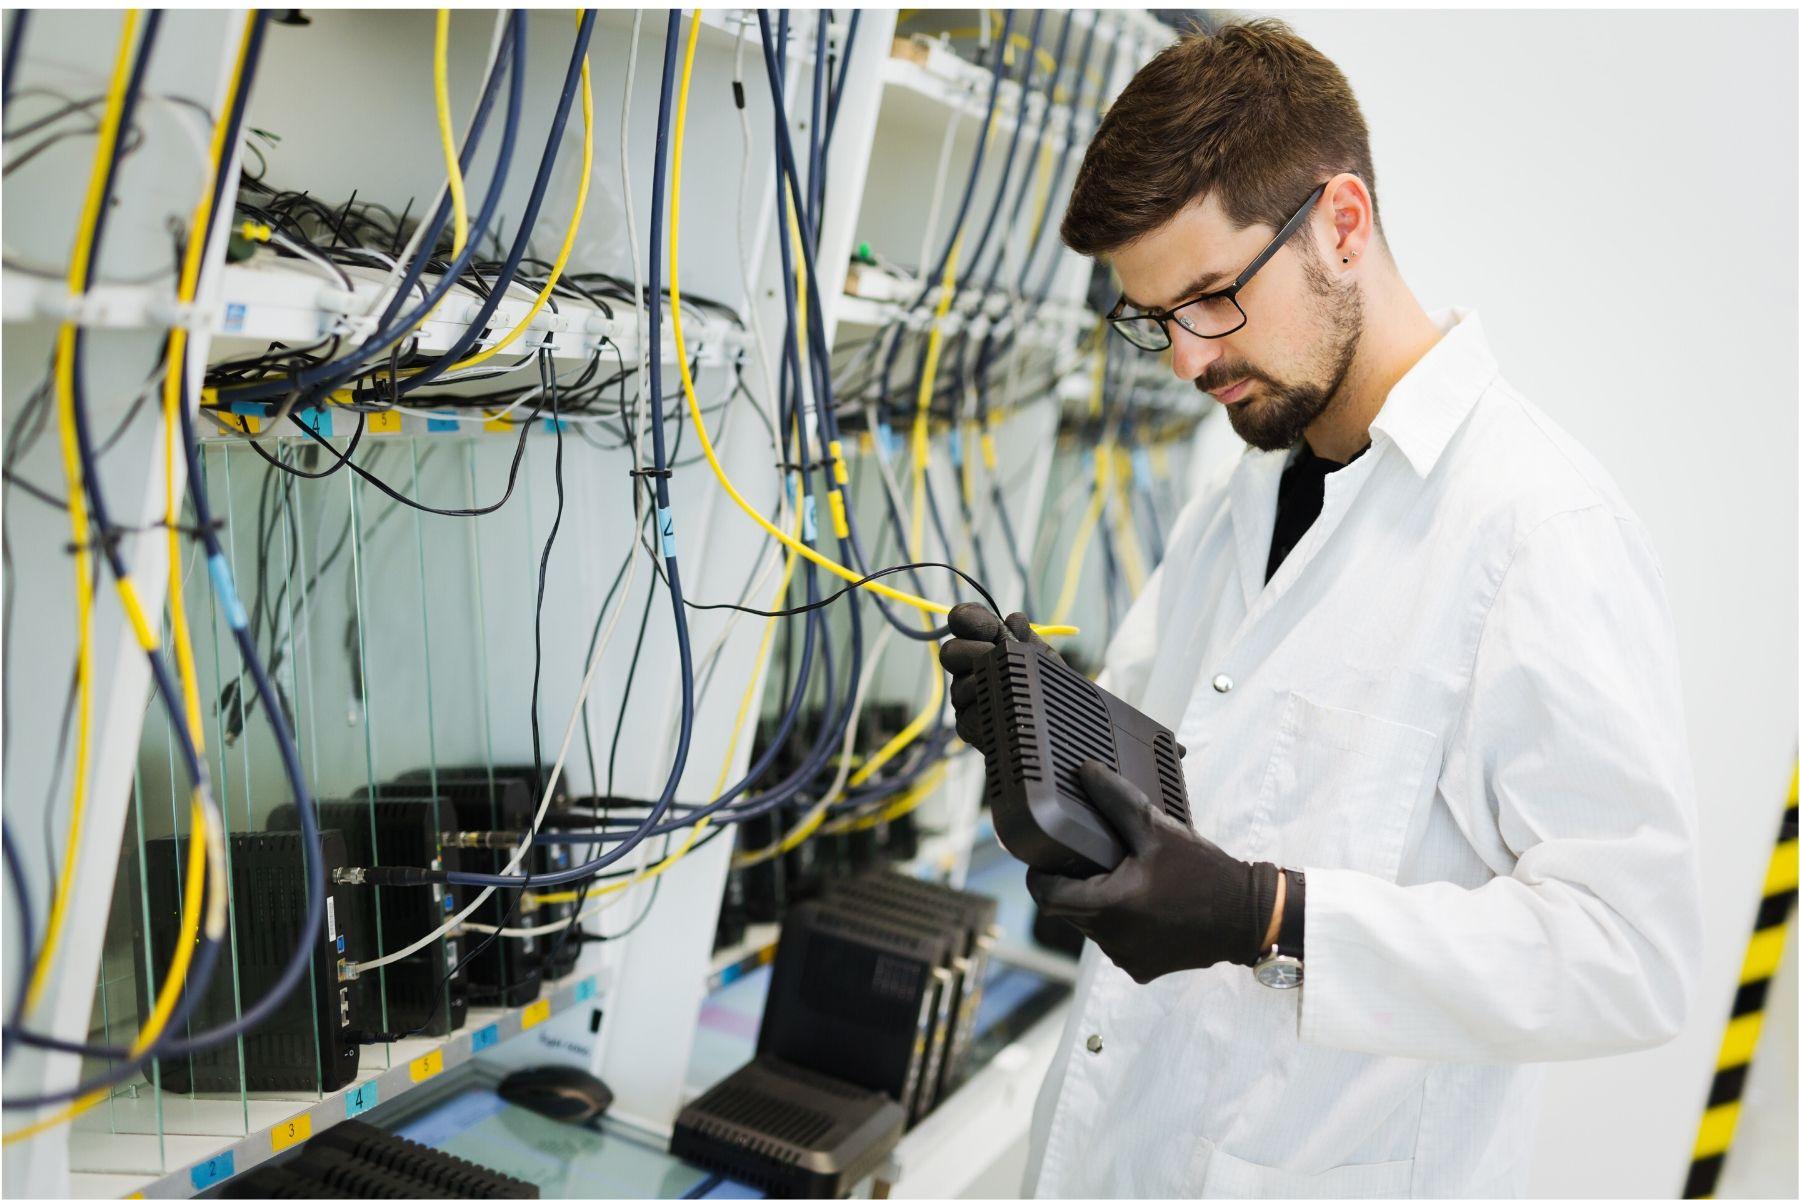 Computer Network Technician Image